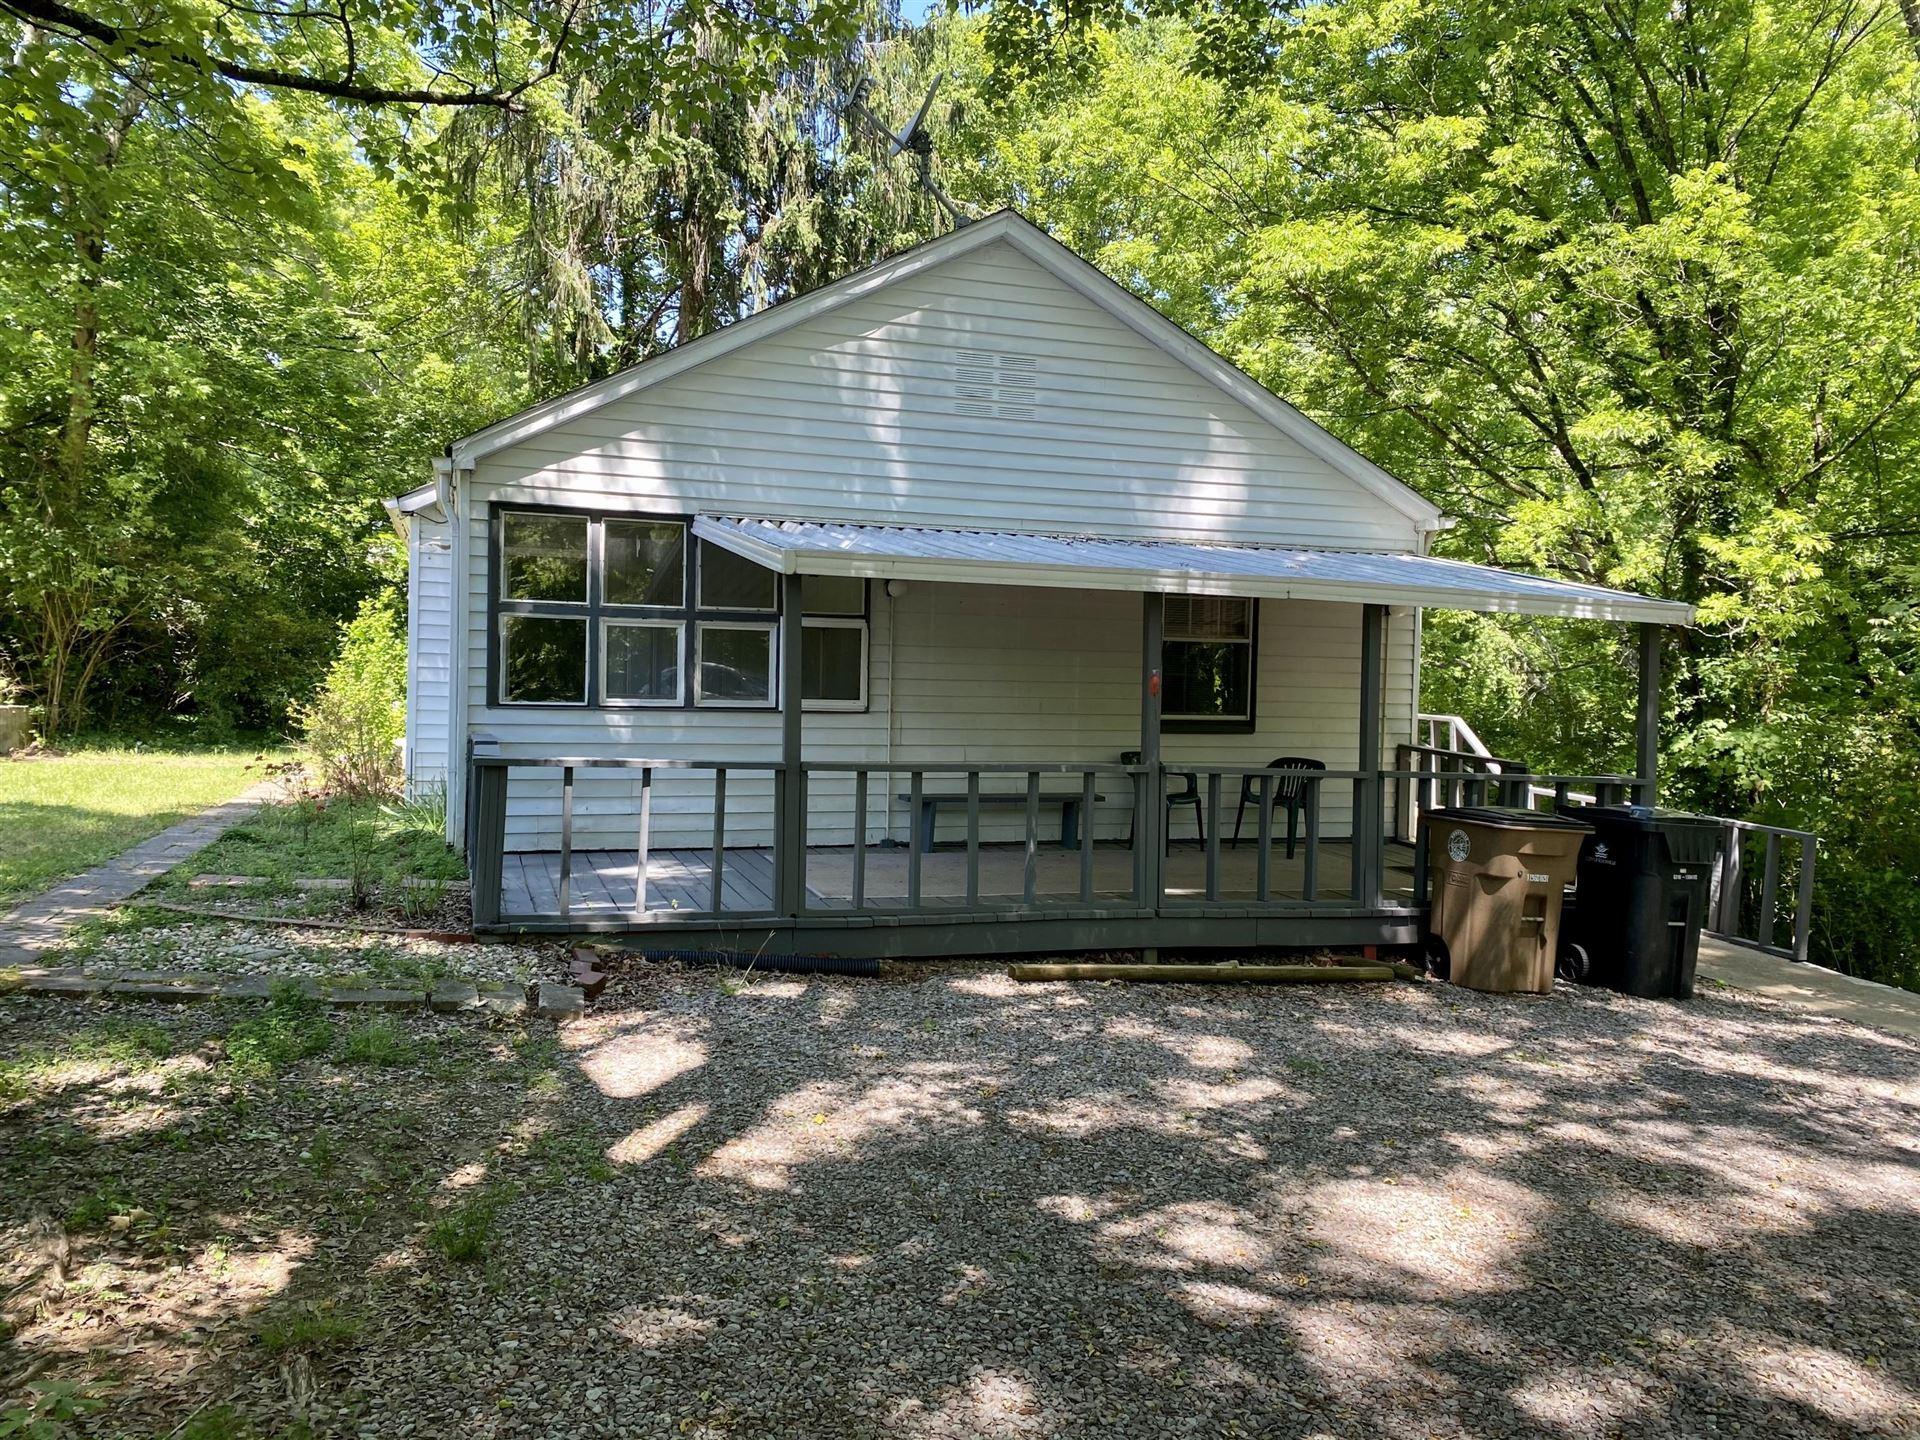 Photo of 5604 Jacksboro Pike, Knoxville, TN 37918 (MLS # 1153704)